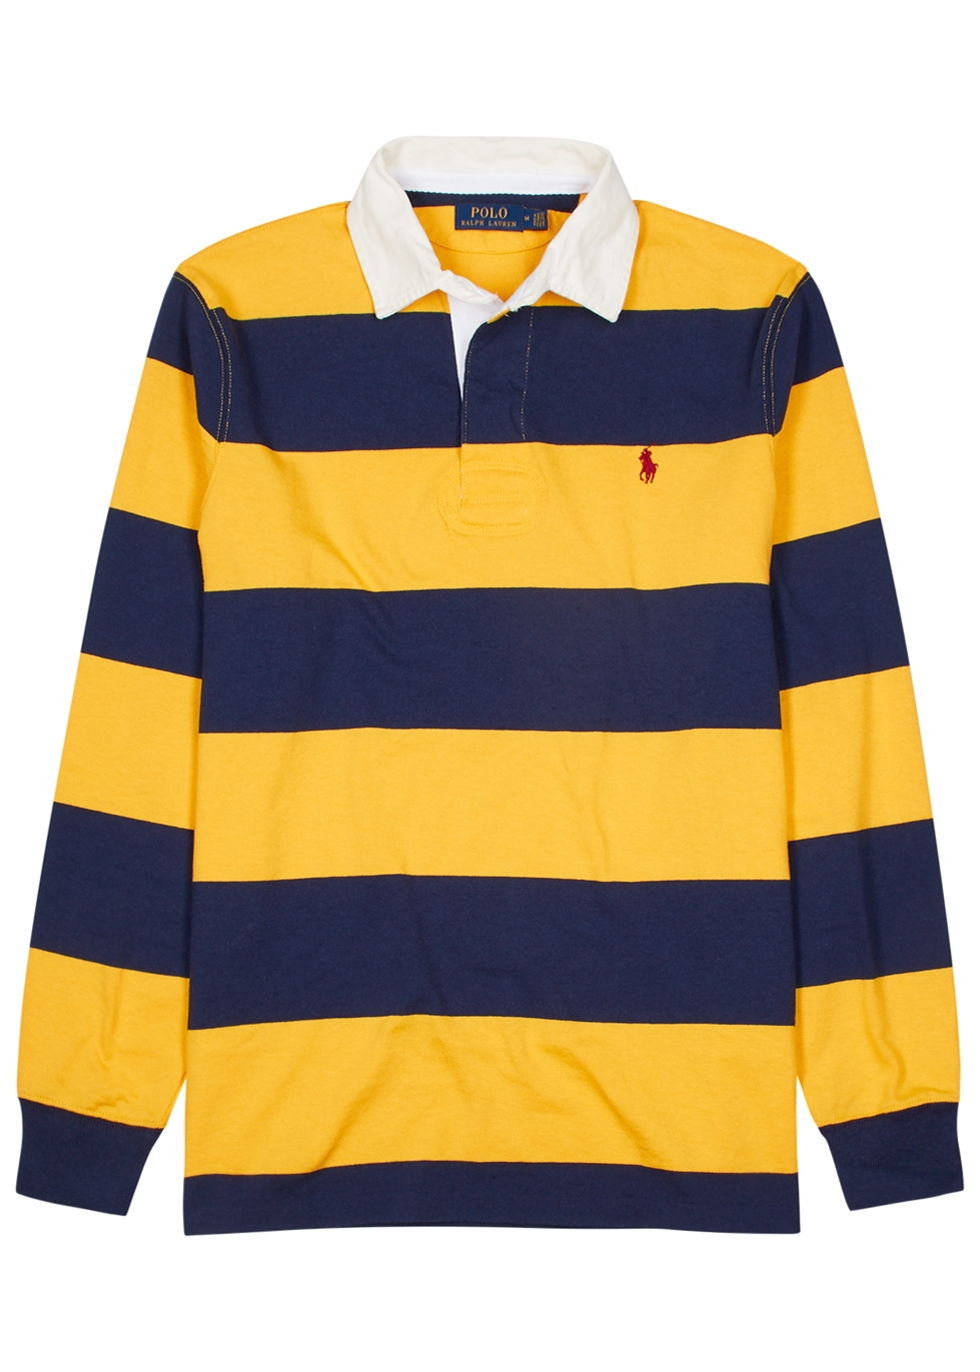 Striped cotton rugby shirt - Polo Ralph Lauren